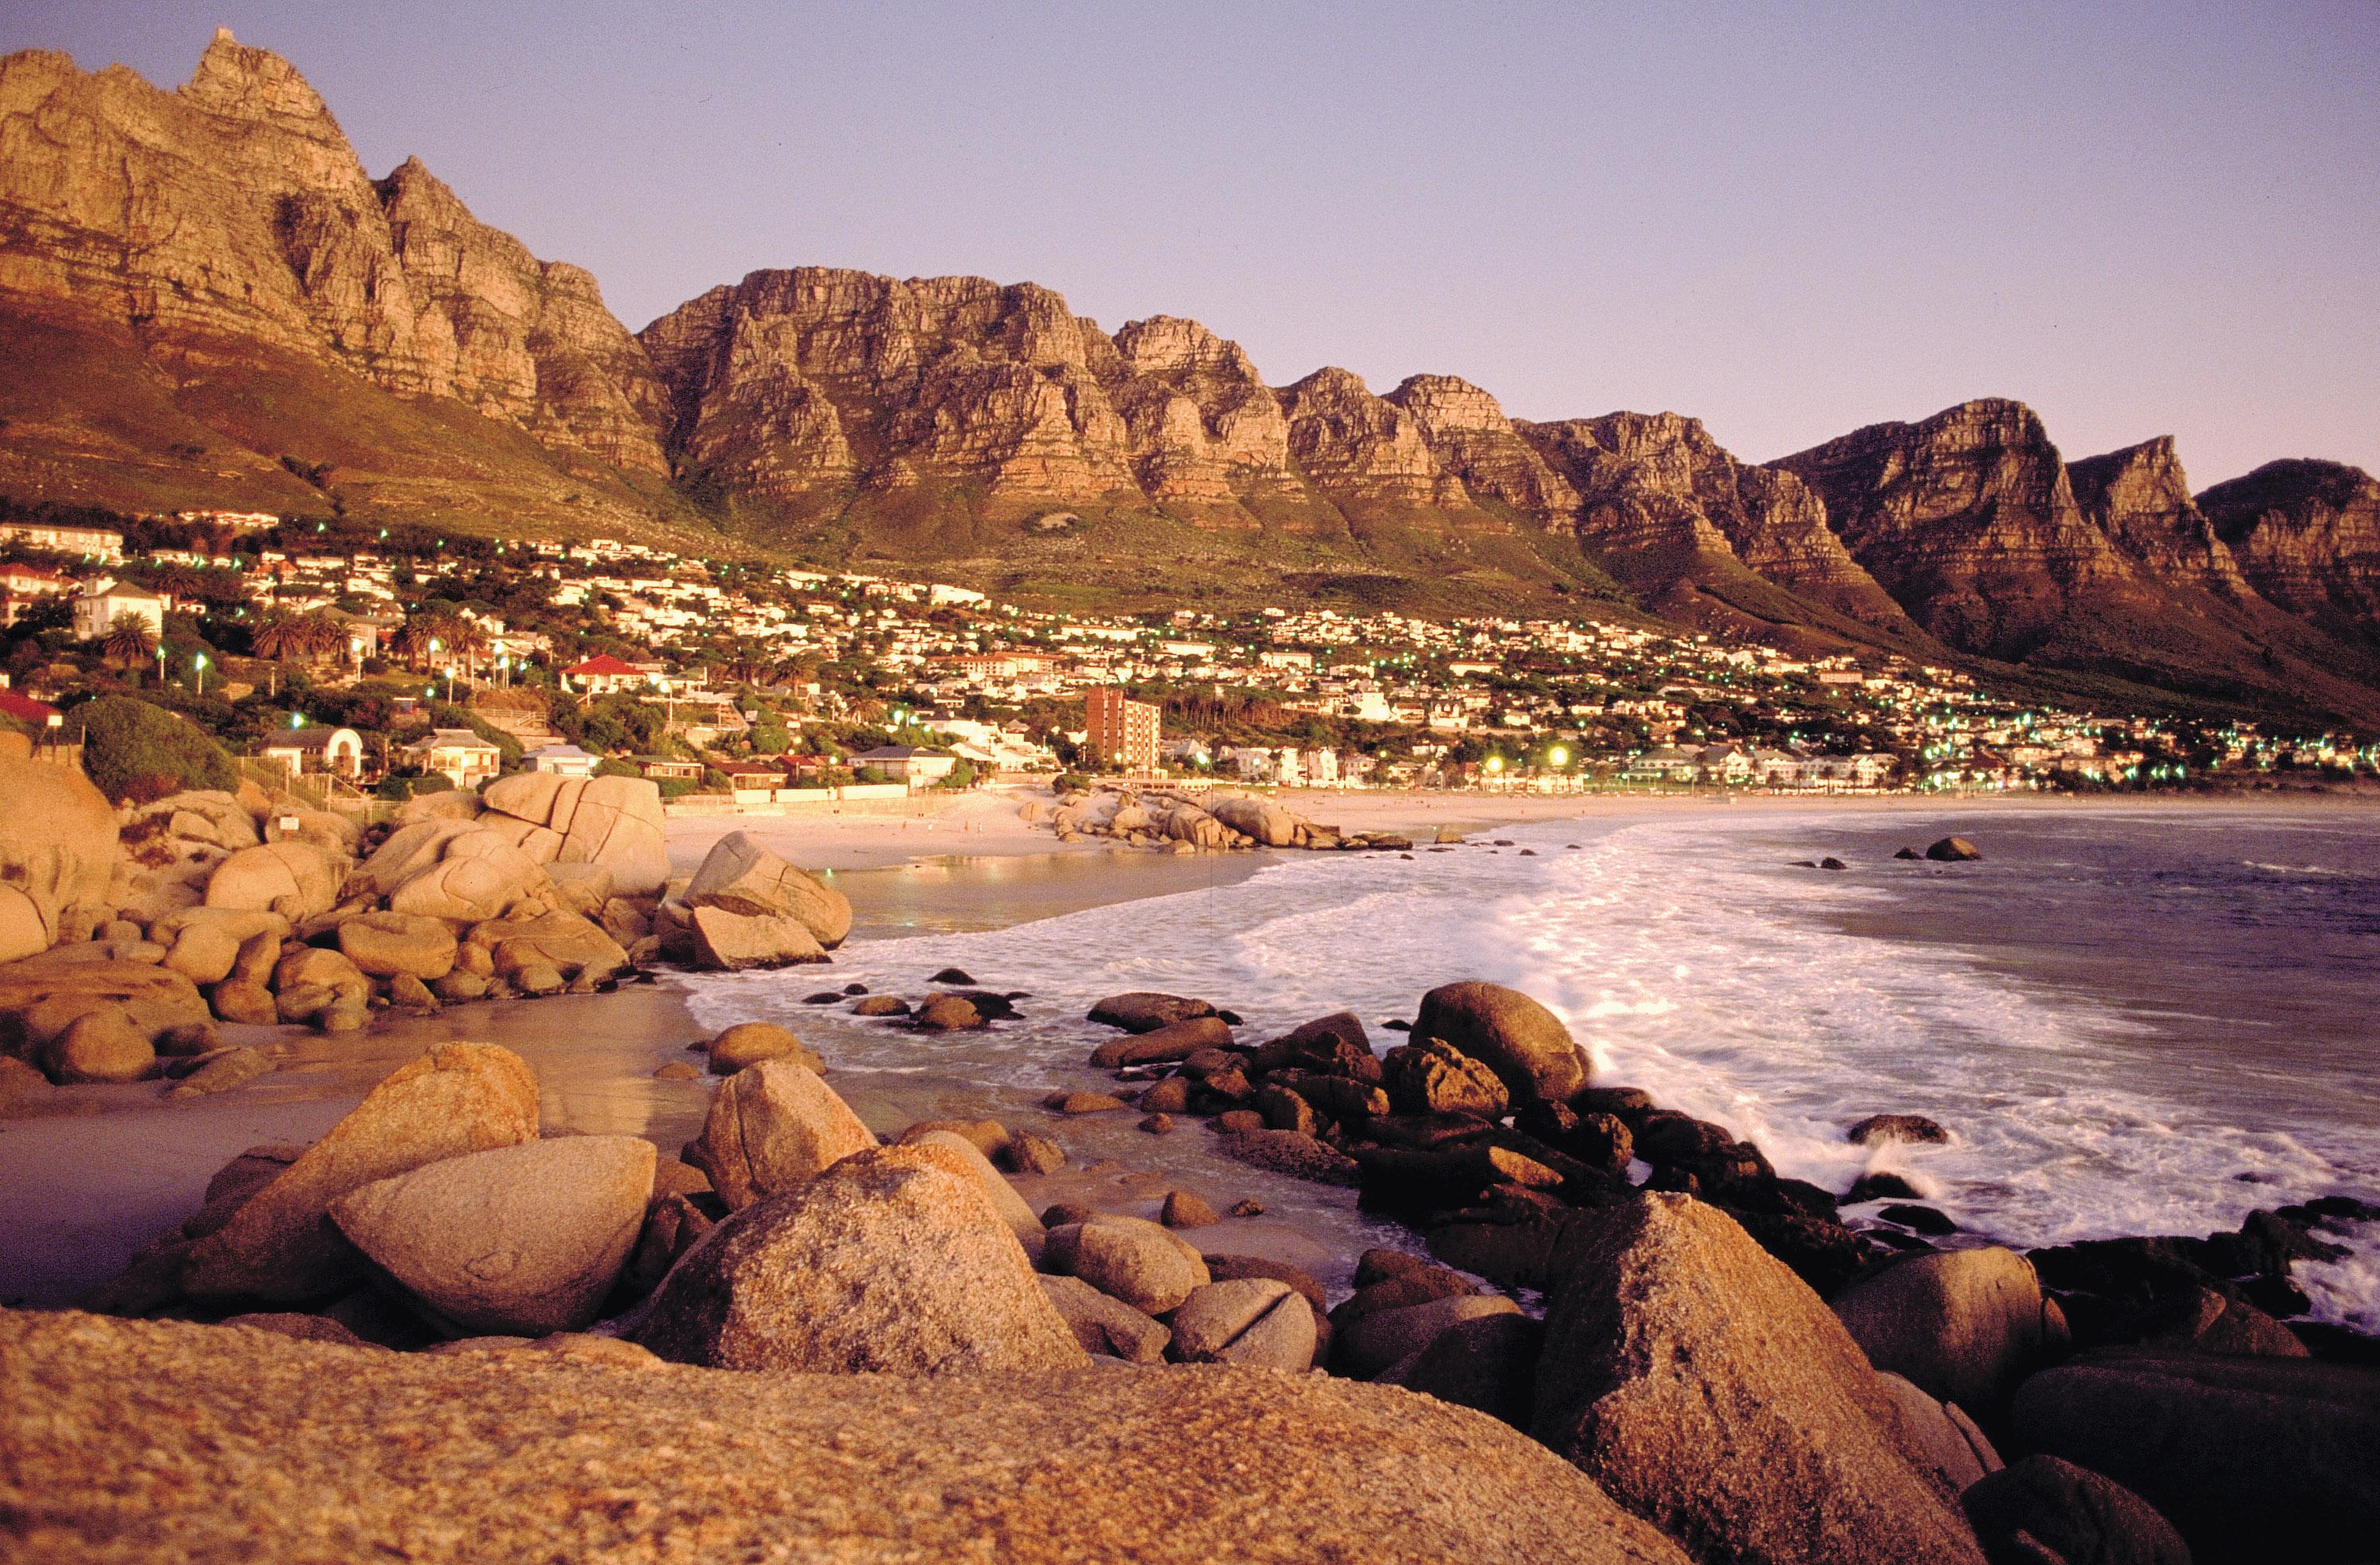 online dating Gauteng Zuid-Afrika online dating meest populair